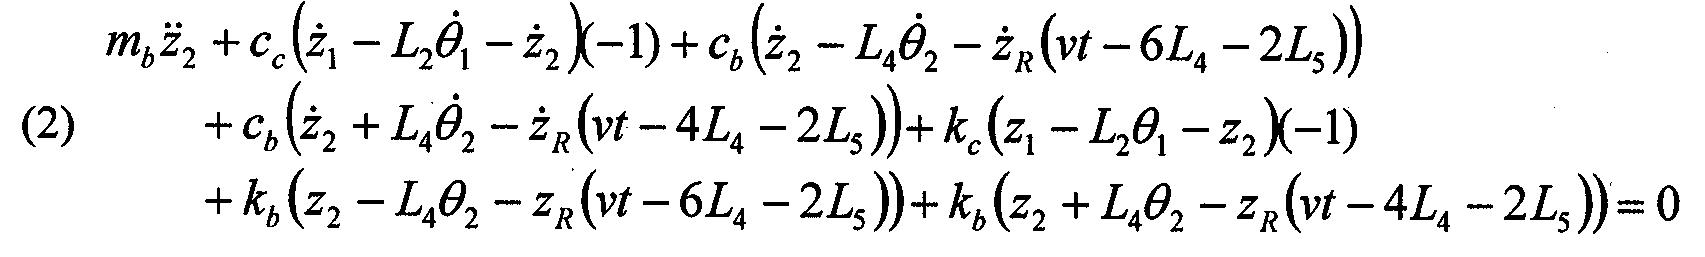 Figure 112004024174039-pat00015